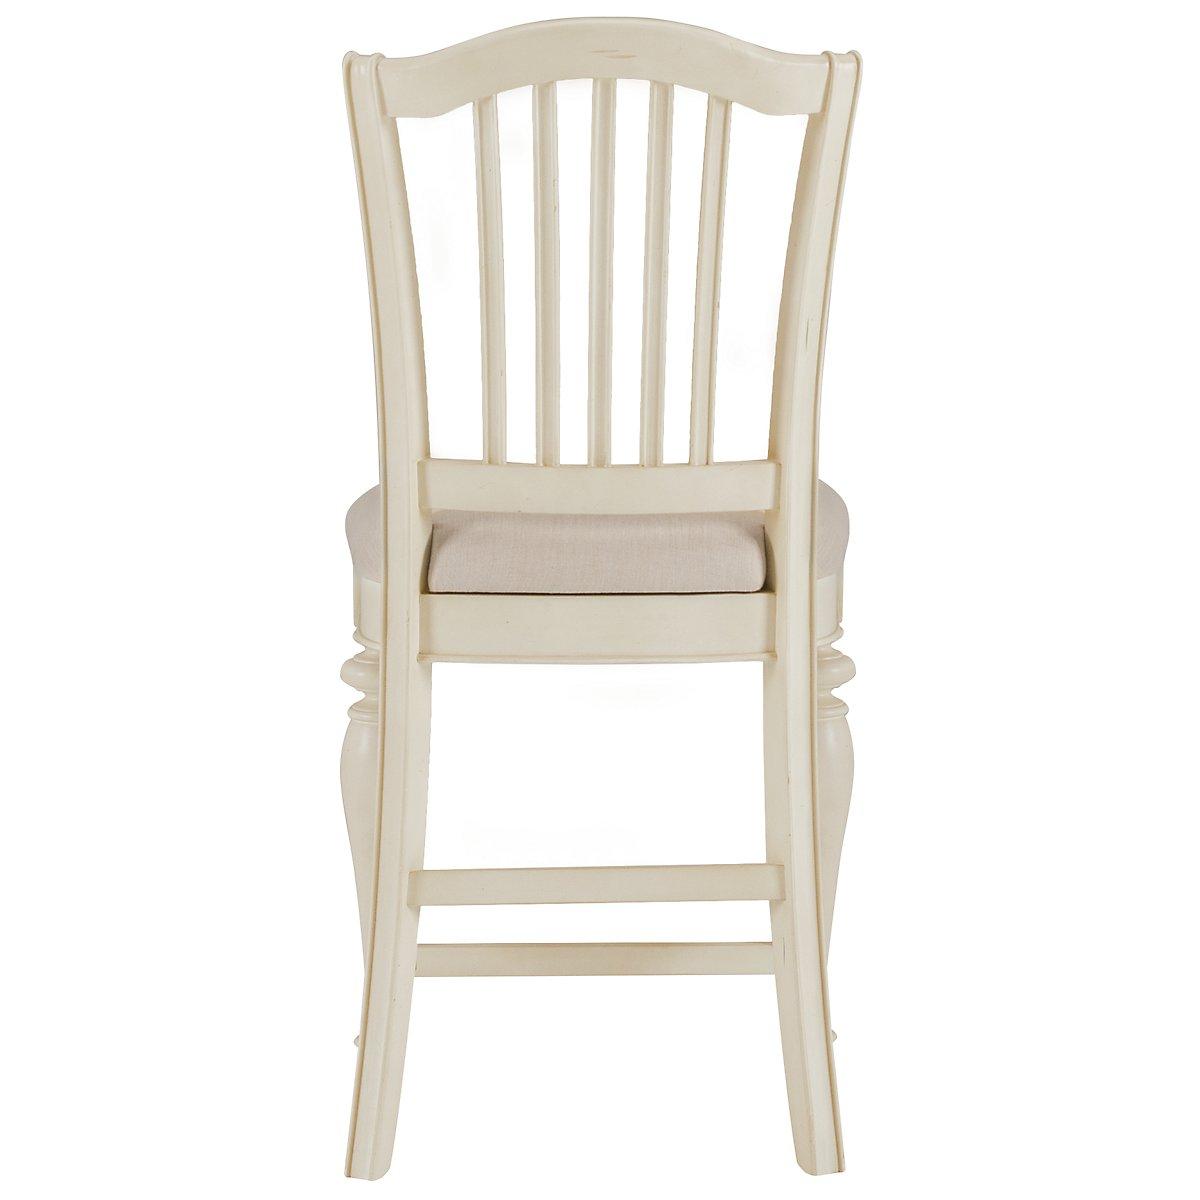 "Coventry White 24"" Wood Barstool"